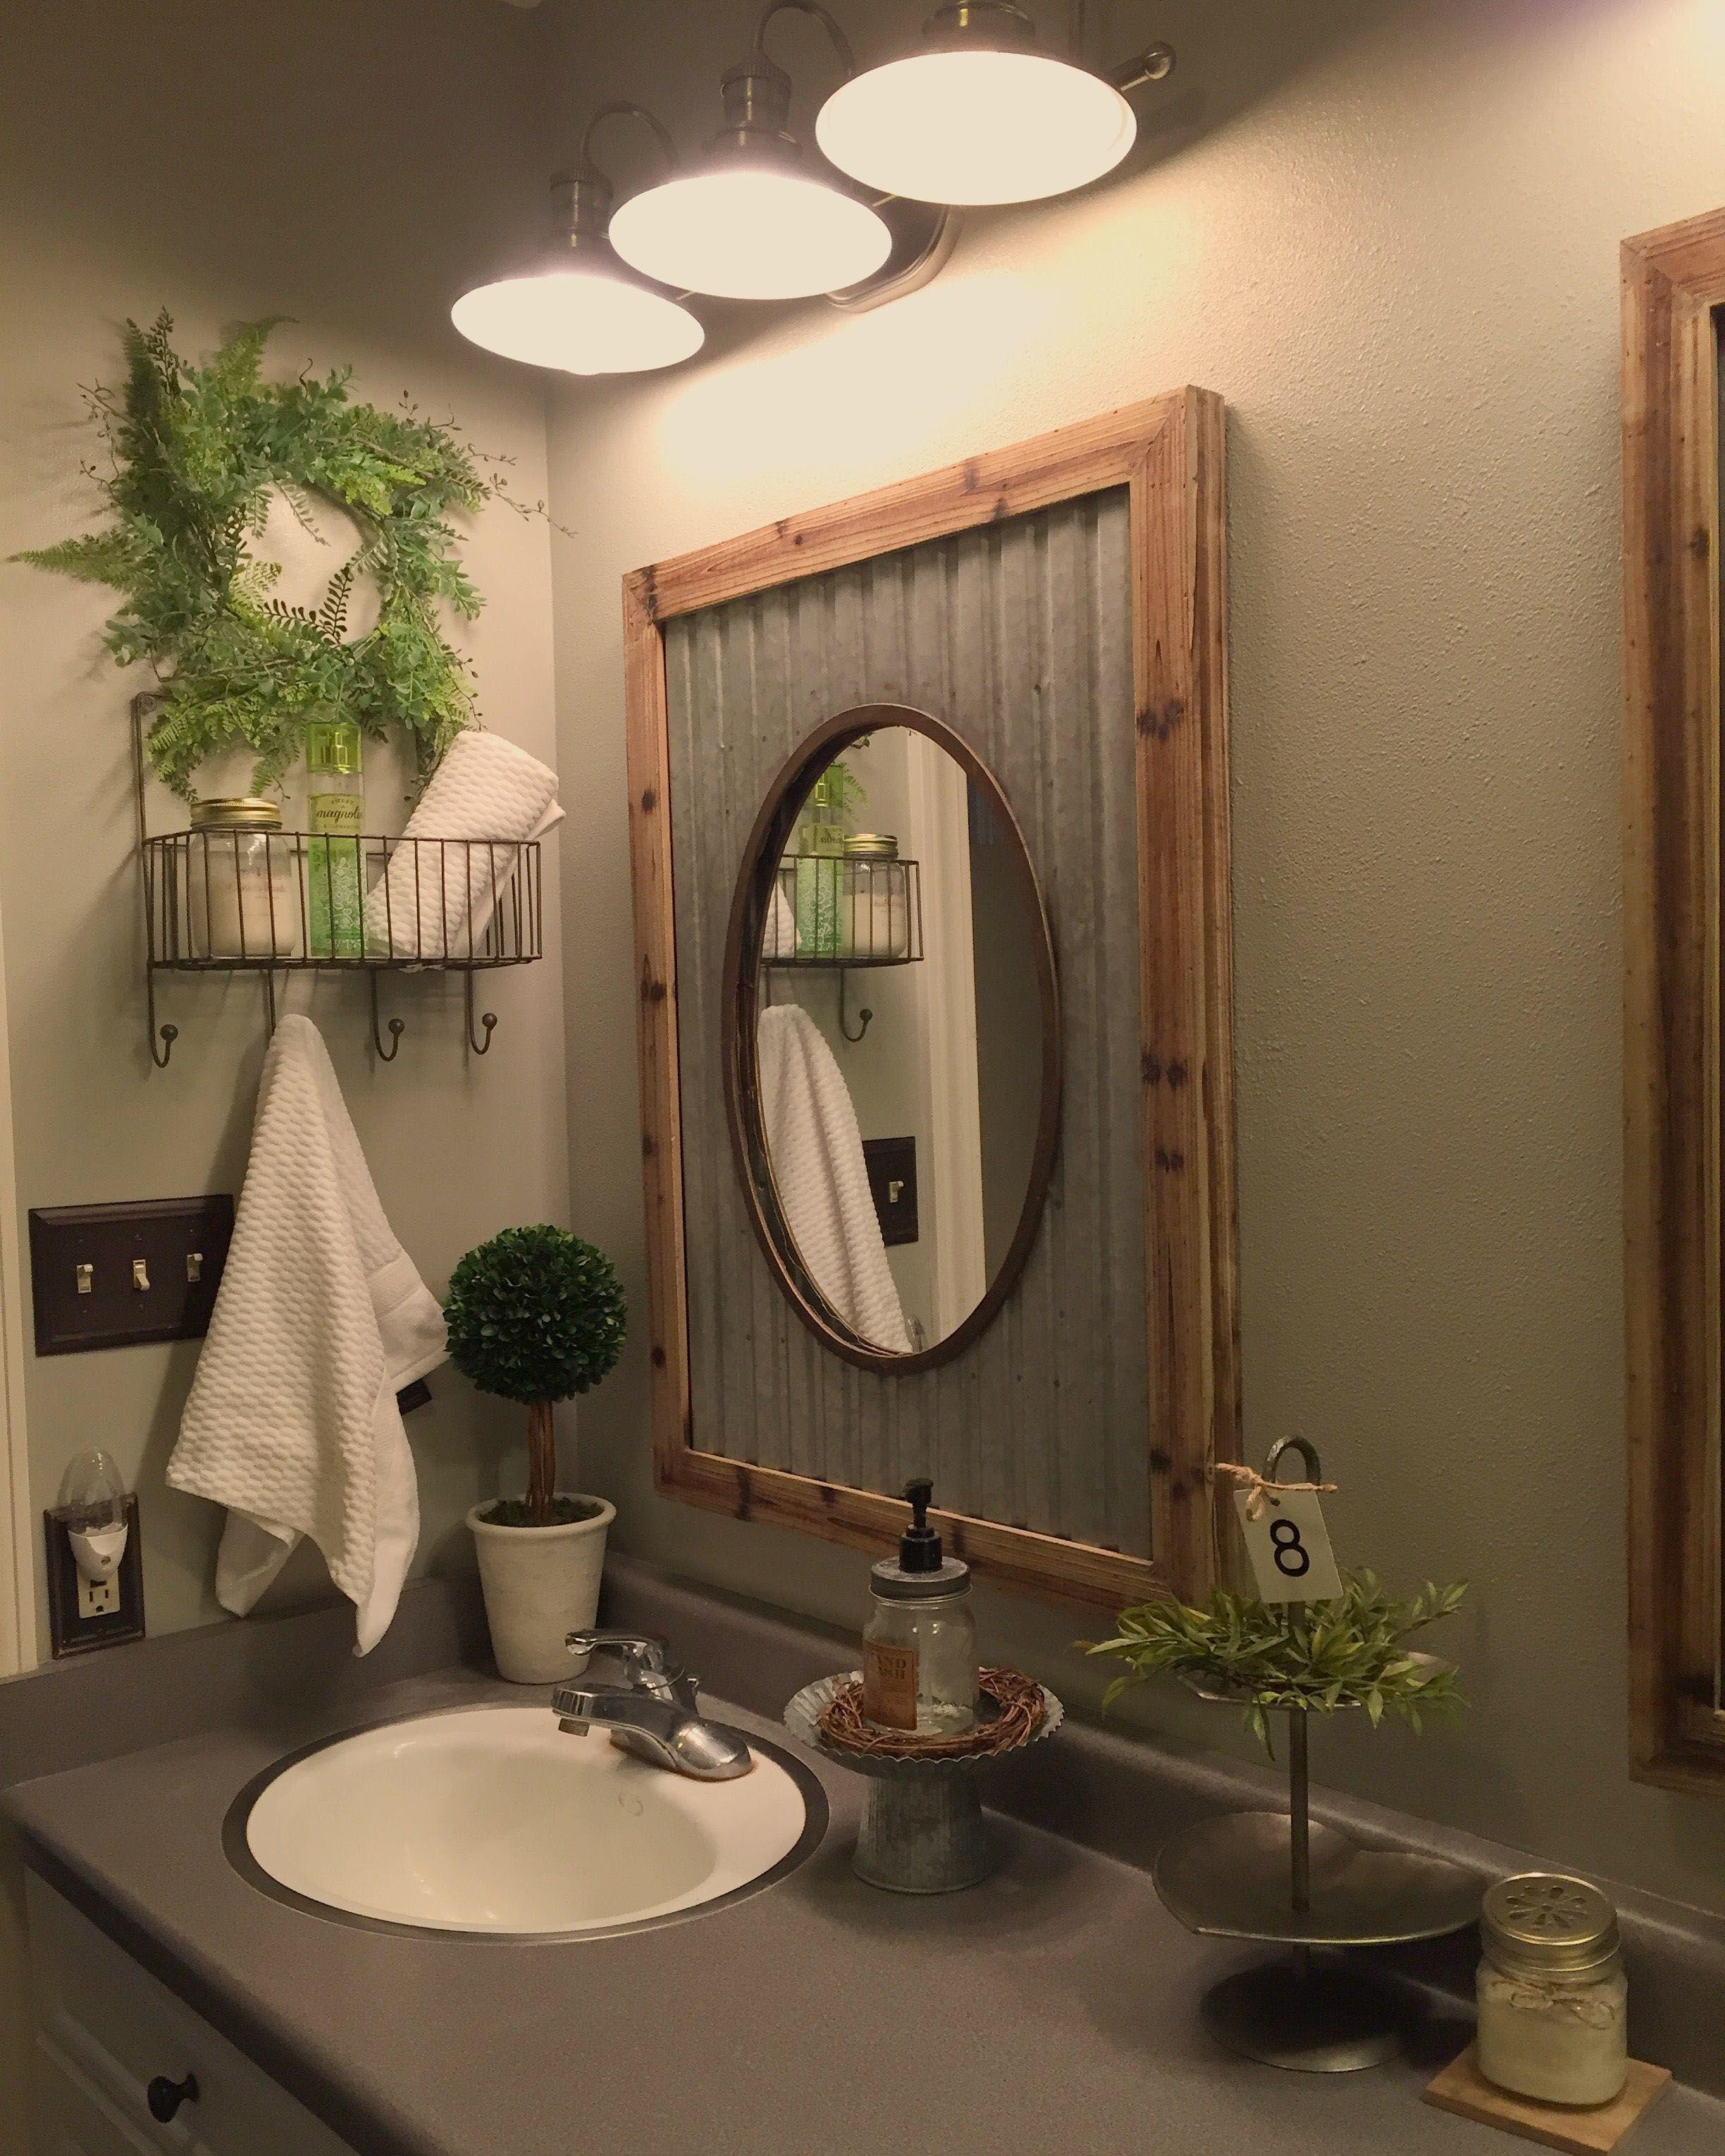 Bathroom Mirror Ideas To Reflect Your Style Rustic Bathroom Mirrors Rustic Bathroom Designs Small Bathroom Decor